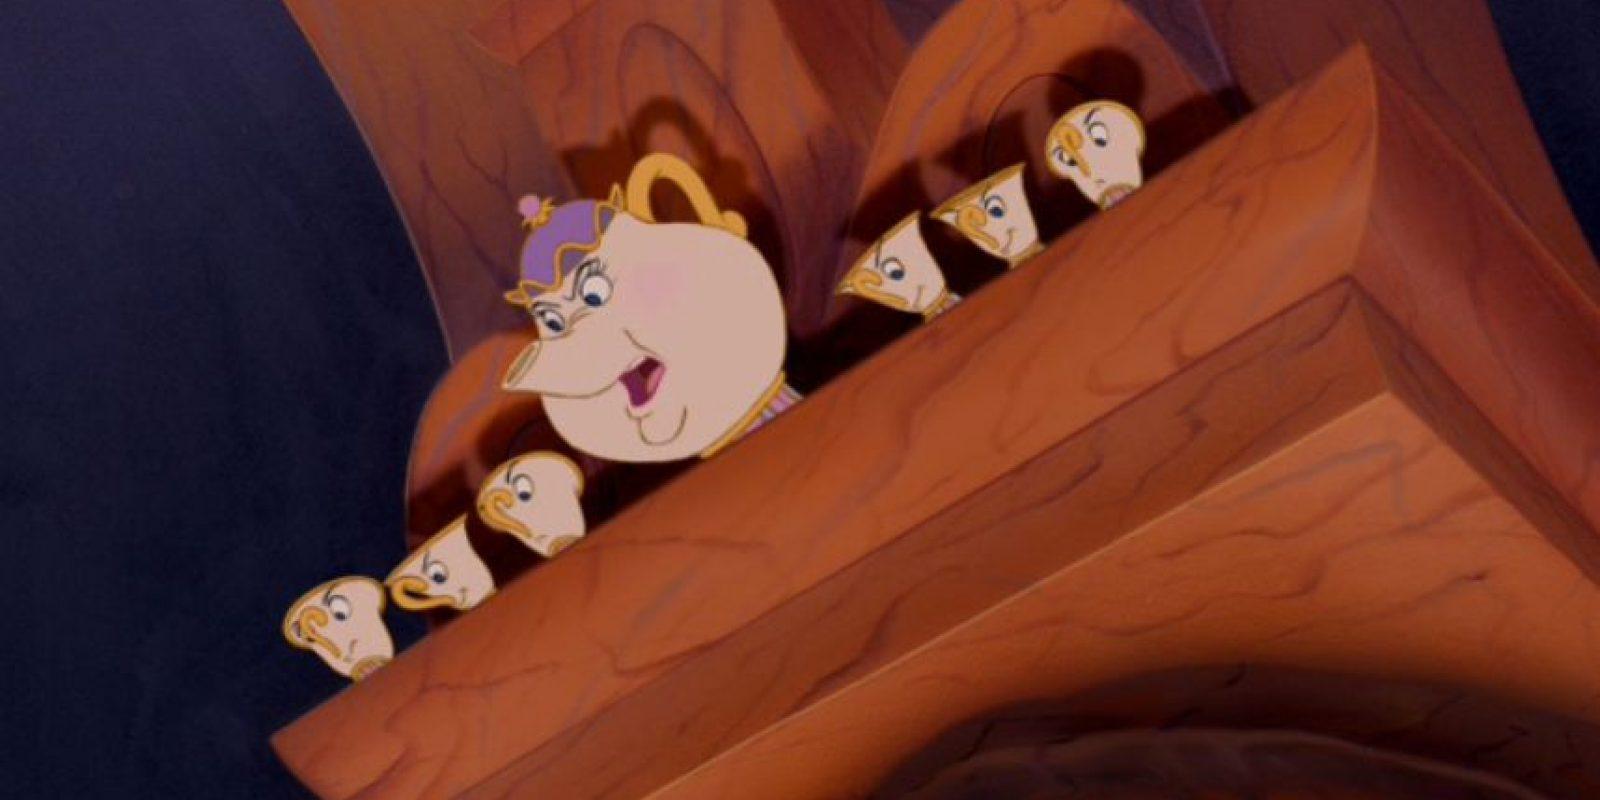 """Mrs Potts"" Foto:Vía Facebook.com/DisneyBeautyAndTheBeast"